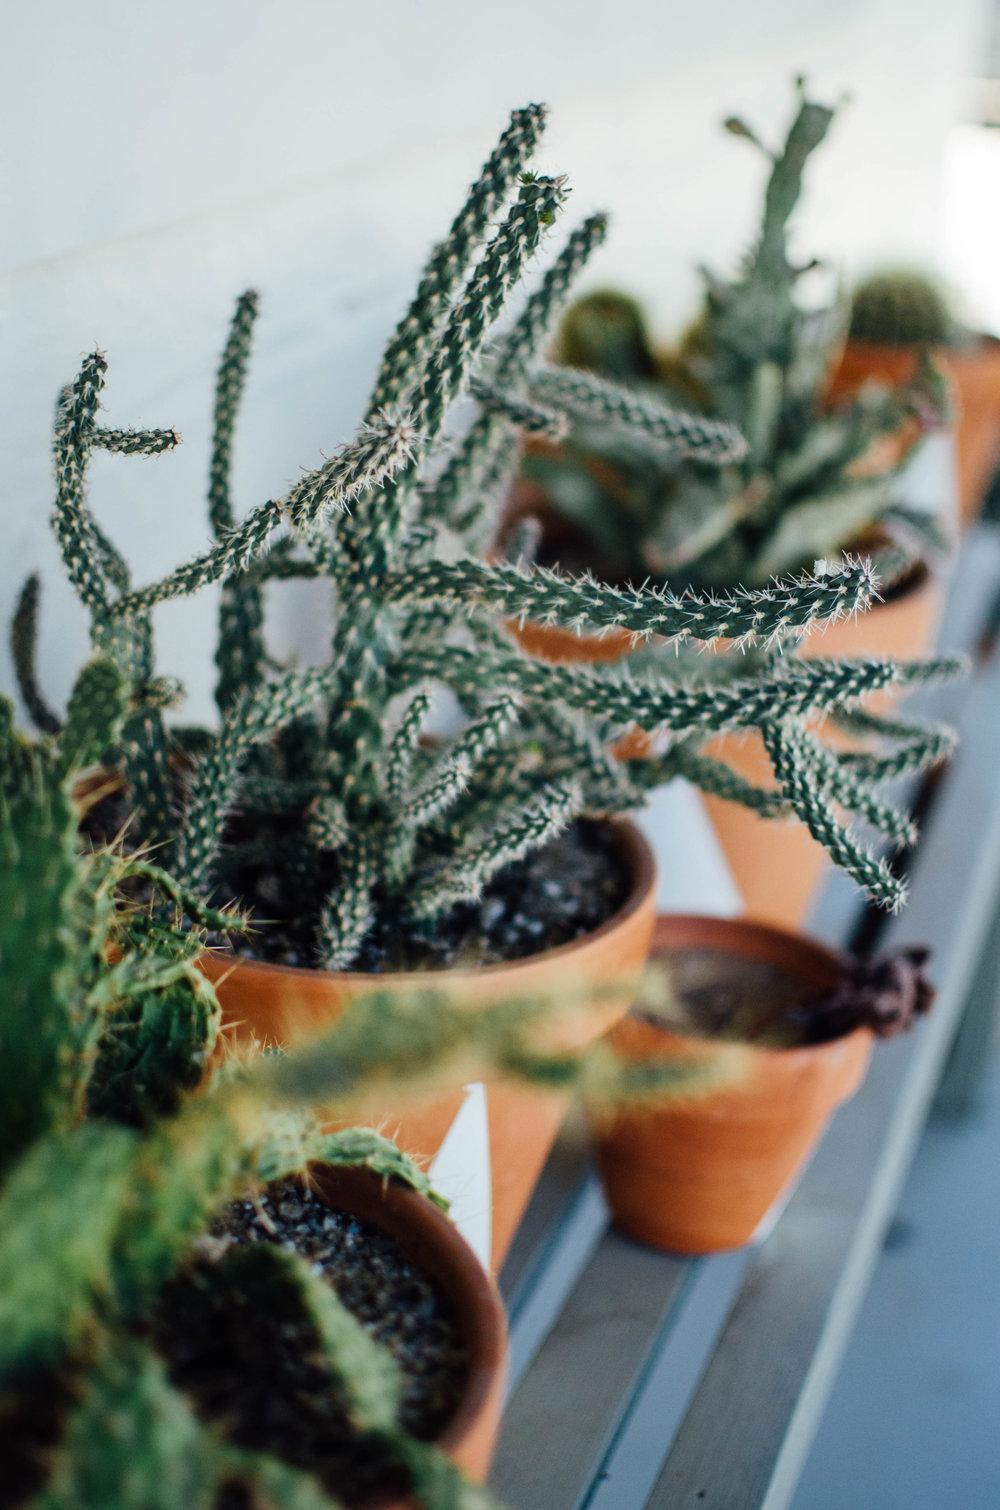 cabin cabin cabin joshua tree airbnb cactus